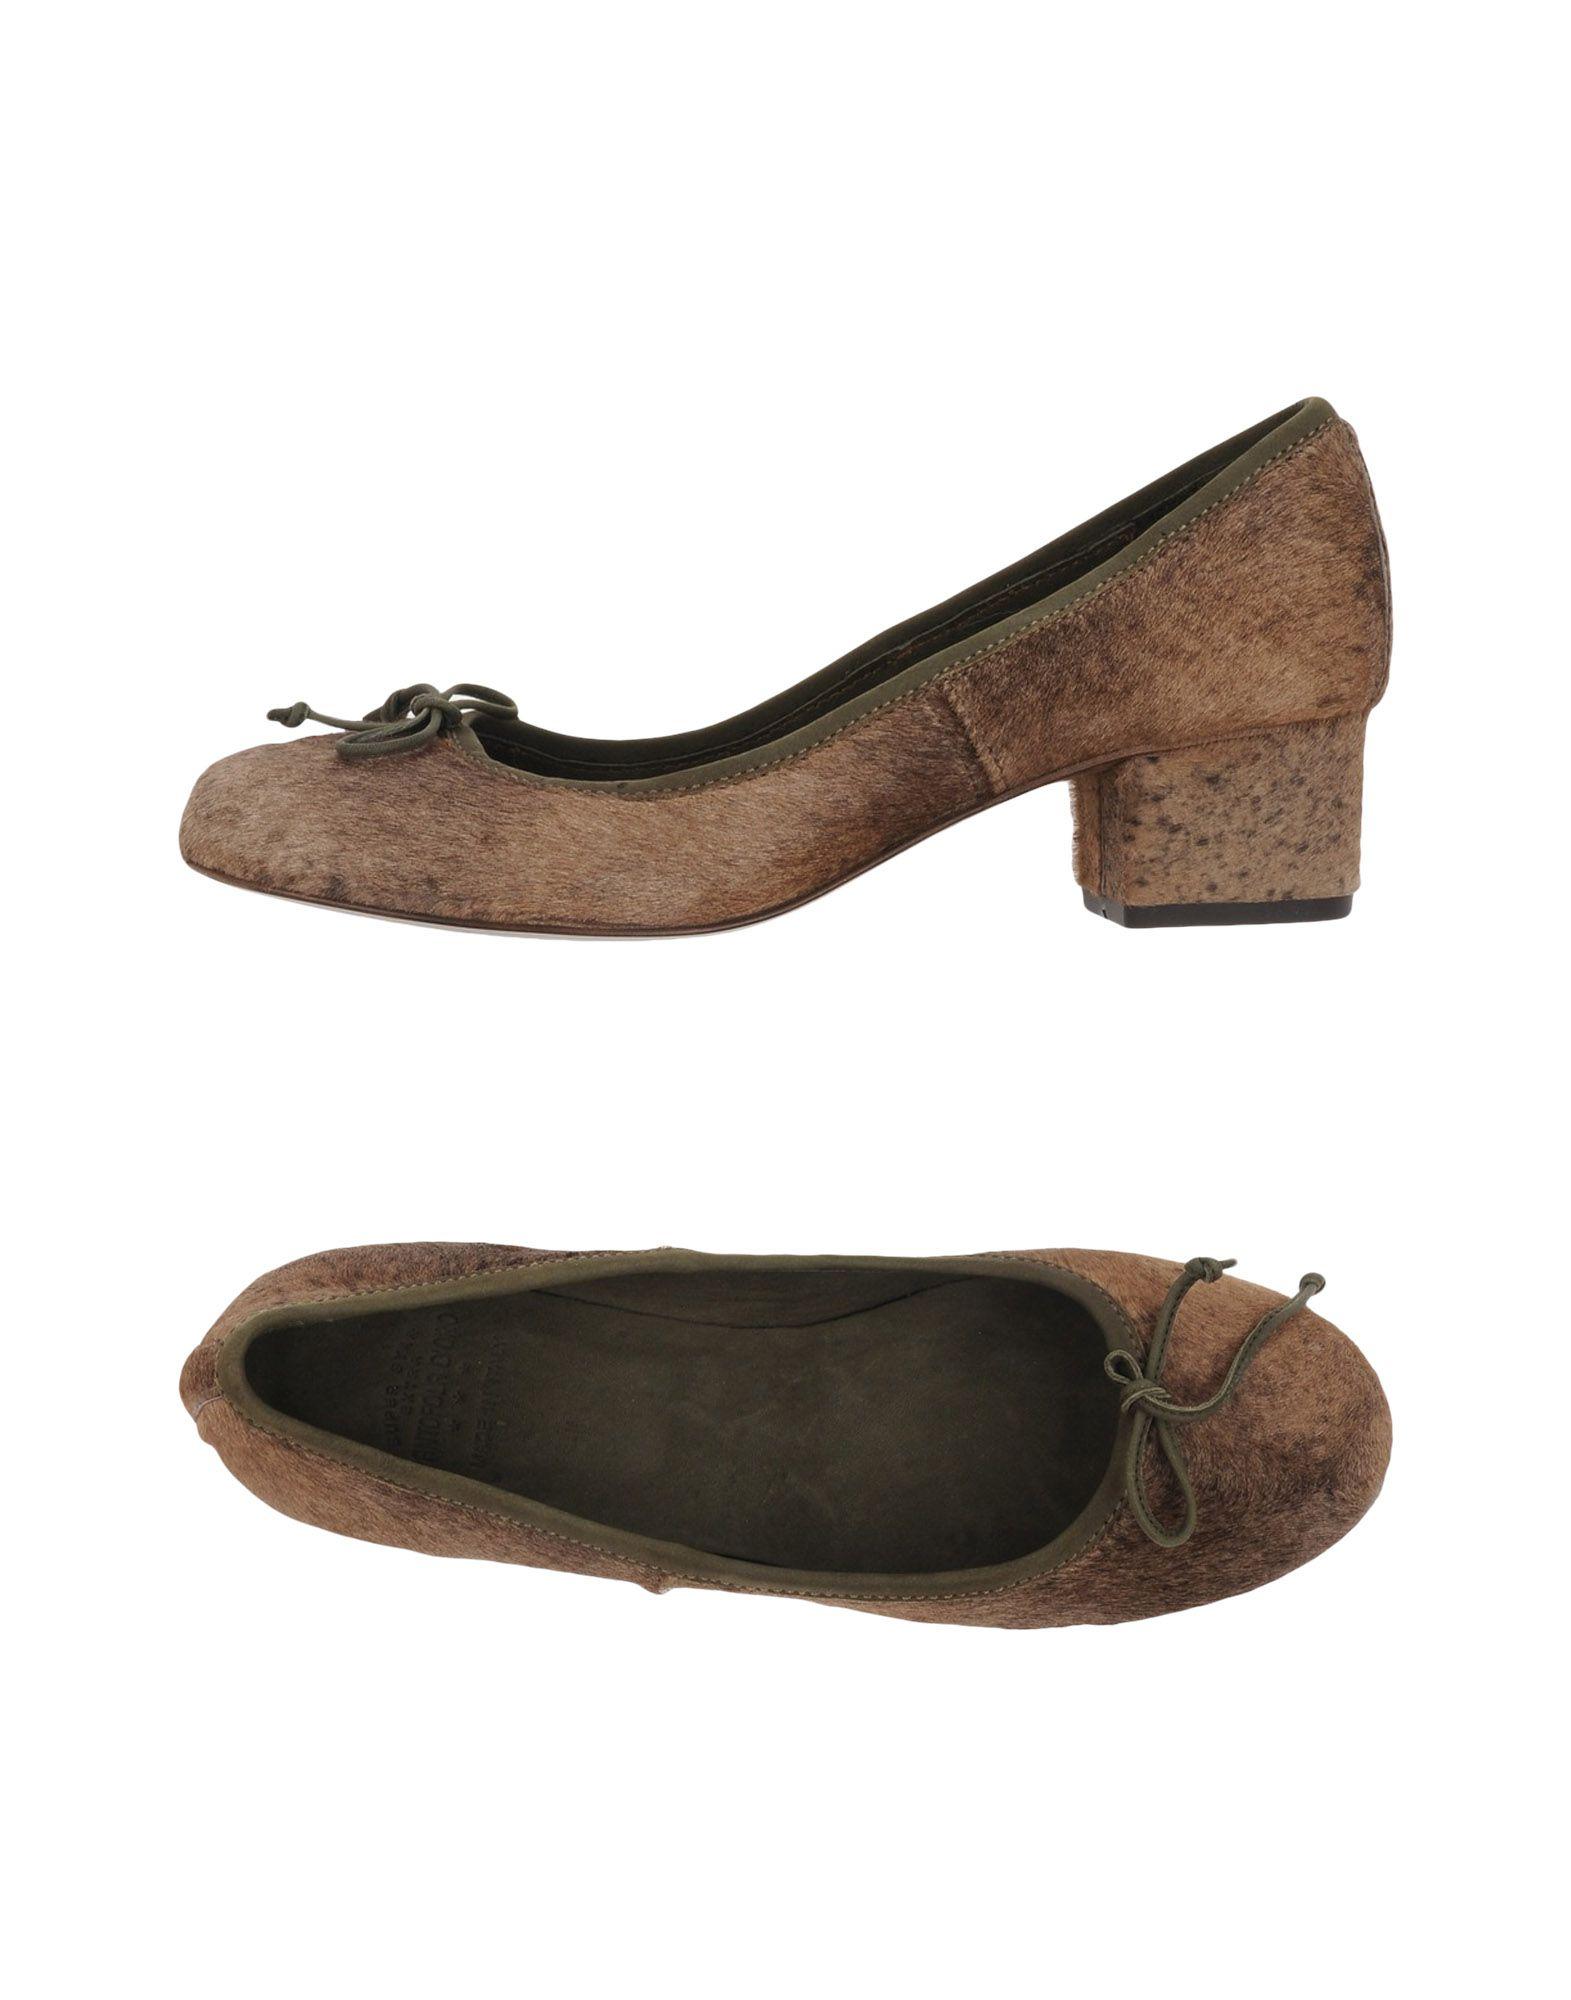 Stilvolle billige Schuhe Pantofola D'oro Pumps Damen  11221111BP